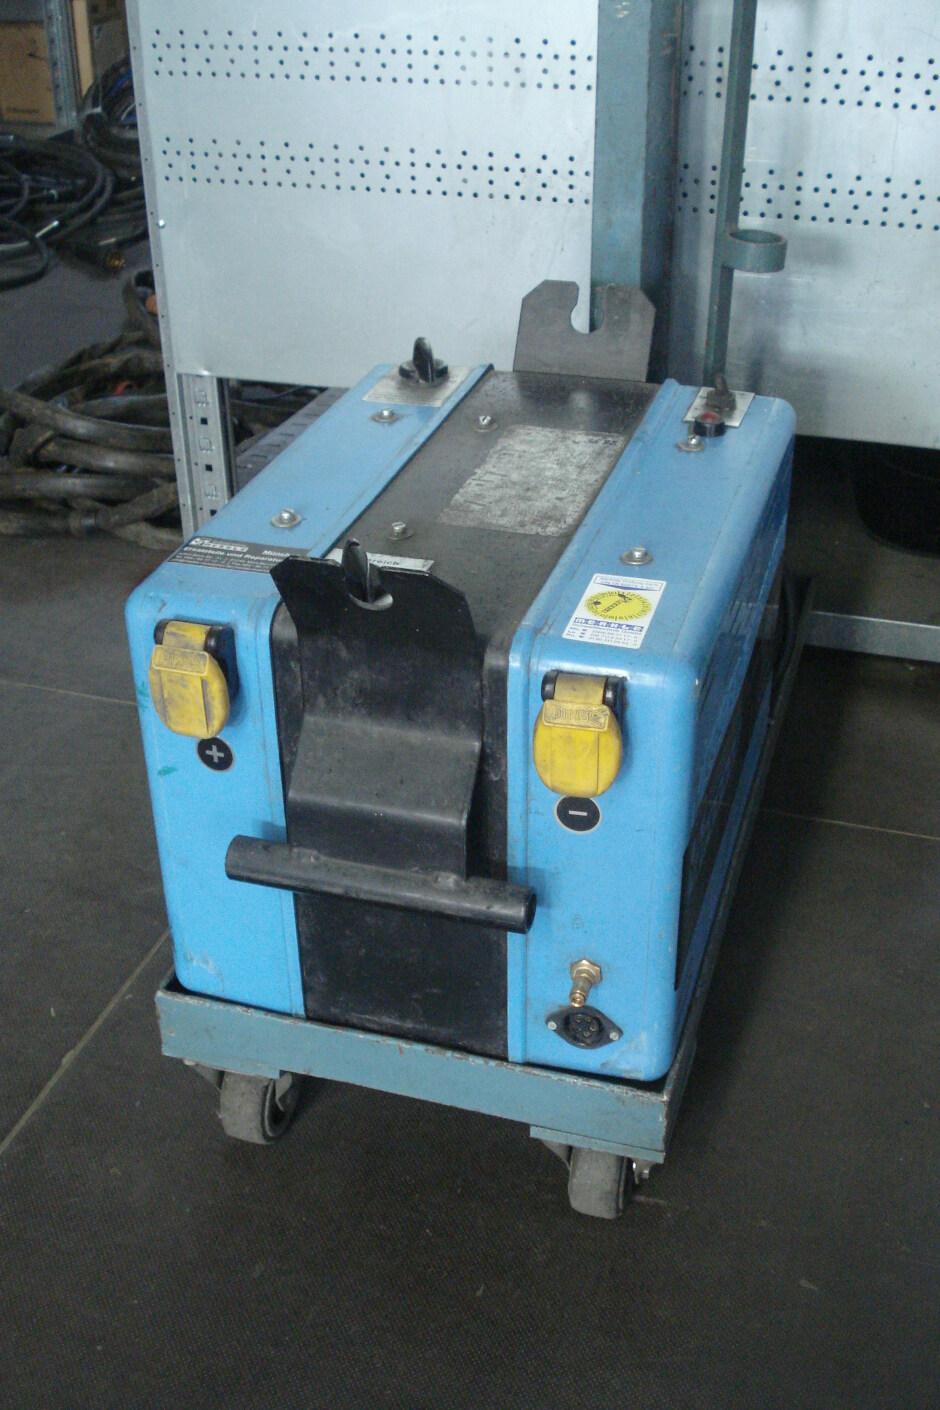 messer griesheim wiggi 130-2 tig welding system used